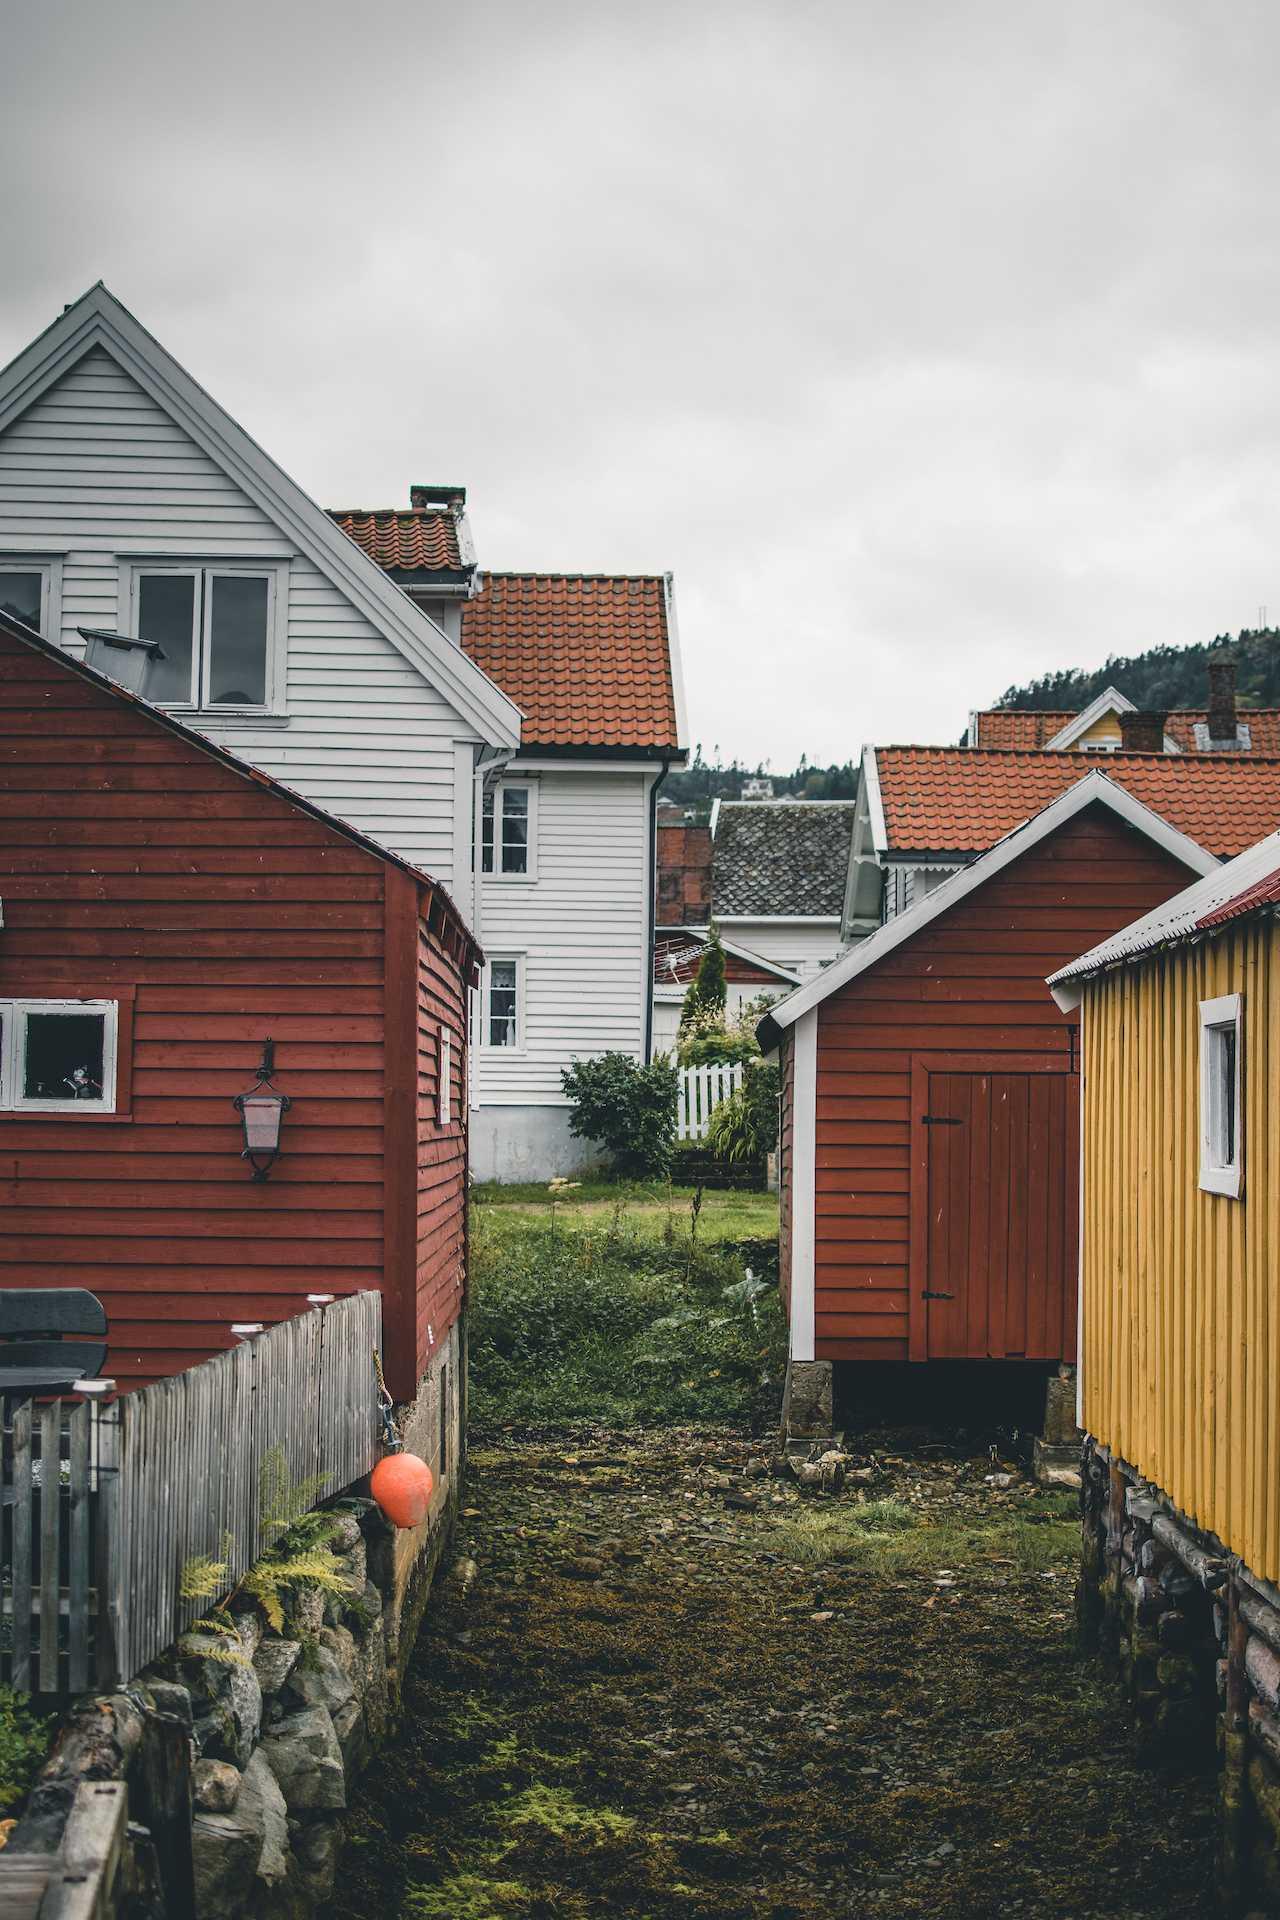 domki wNorwegii